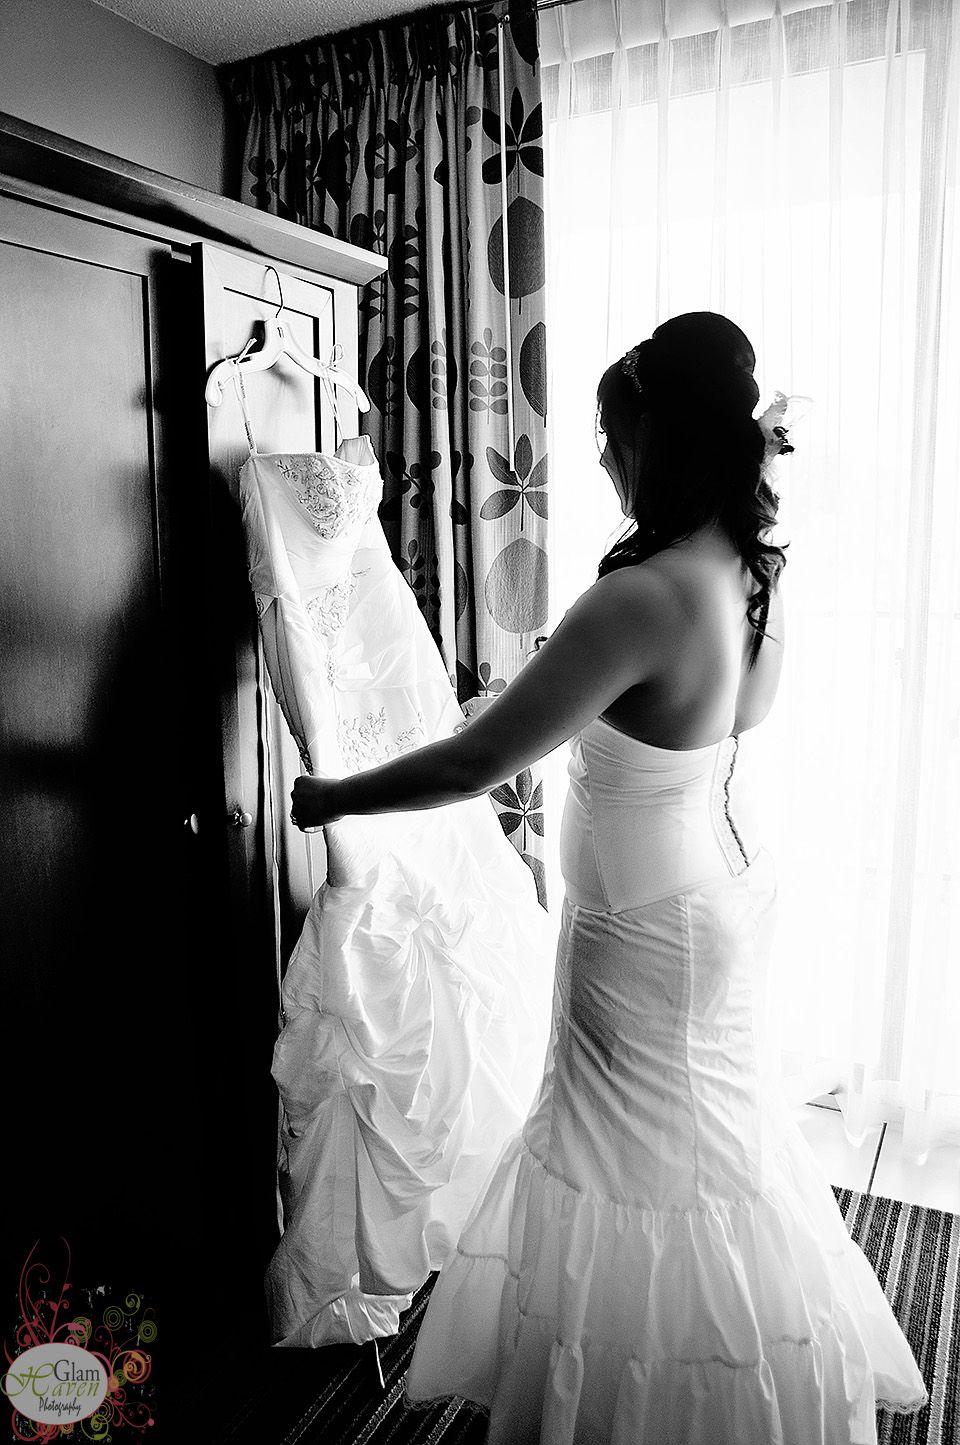 Omaha, ne Wedding, Bridal, wedding dress photography